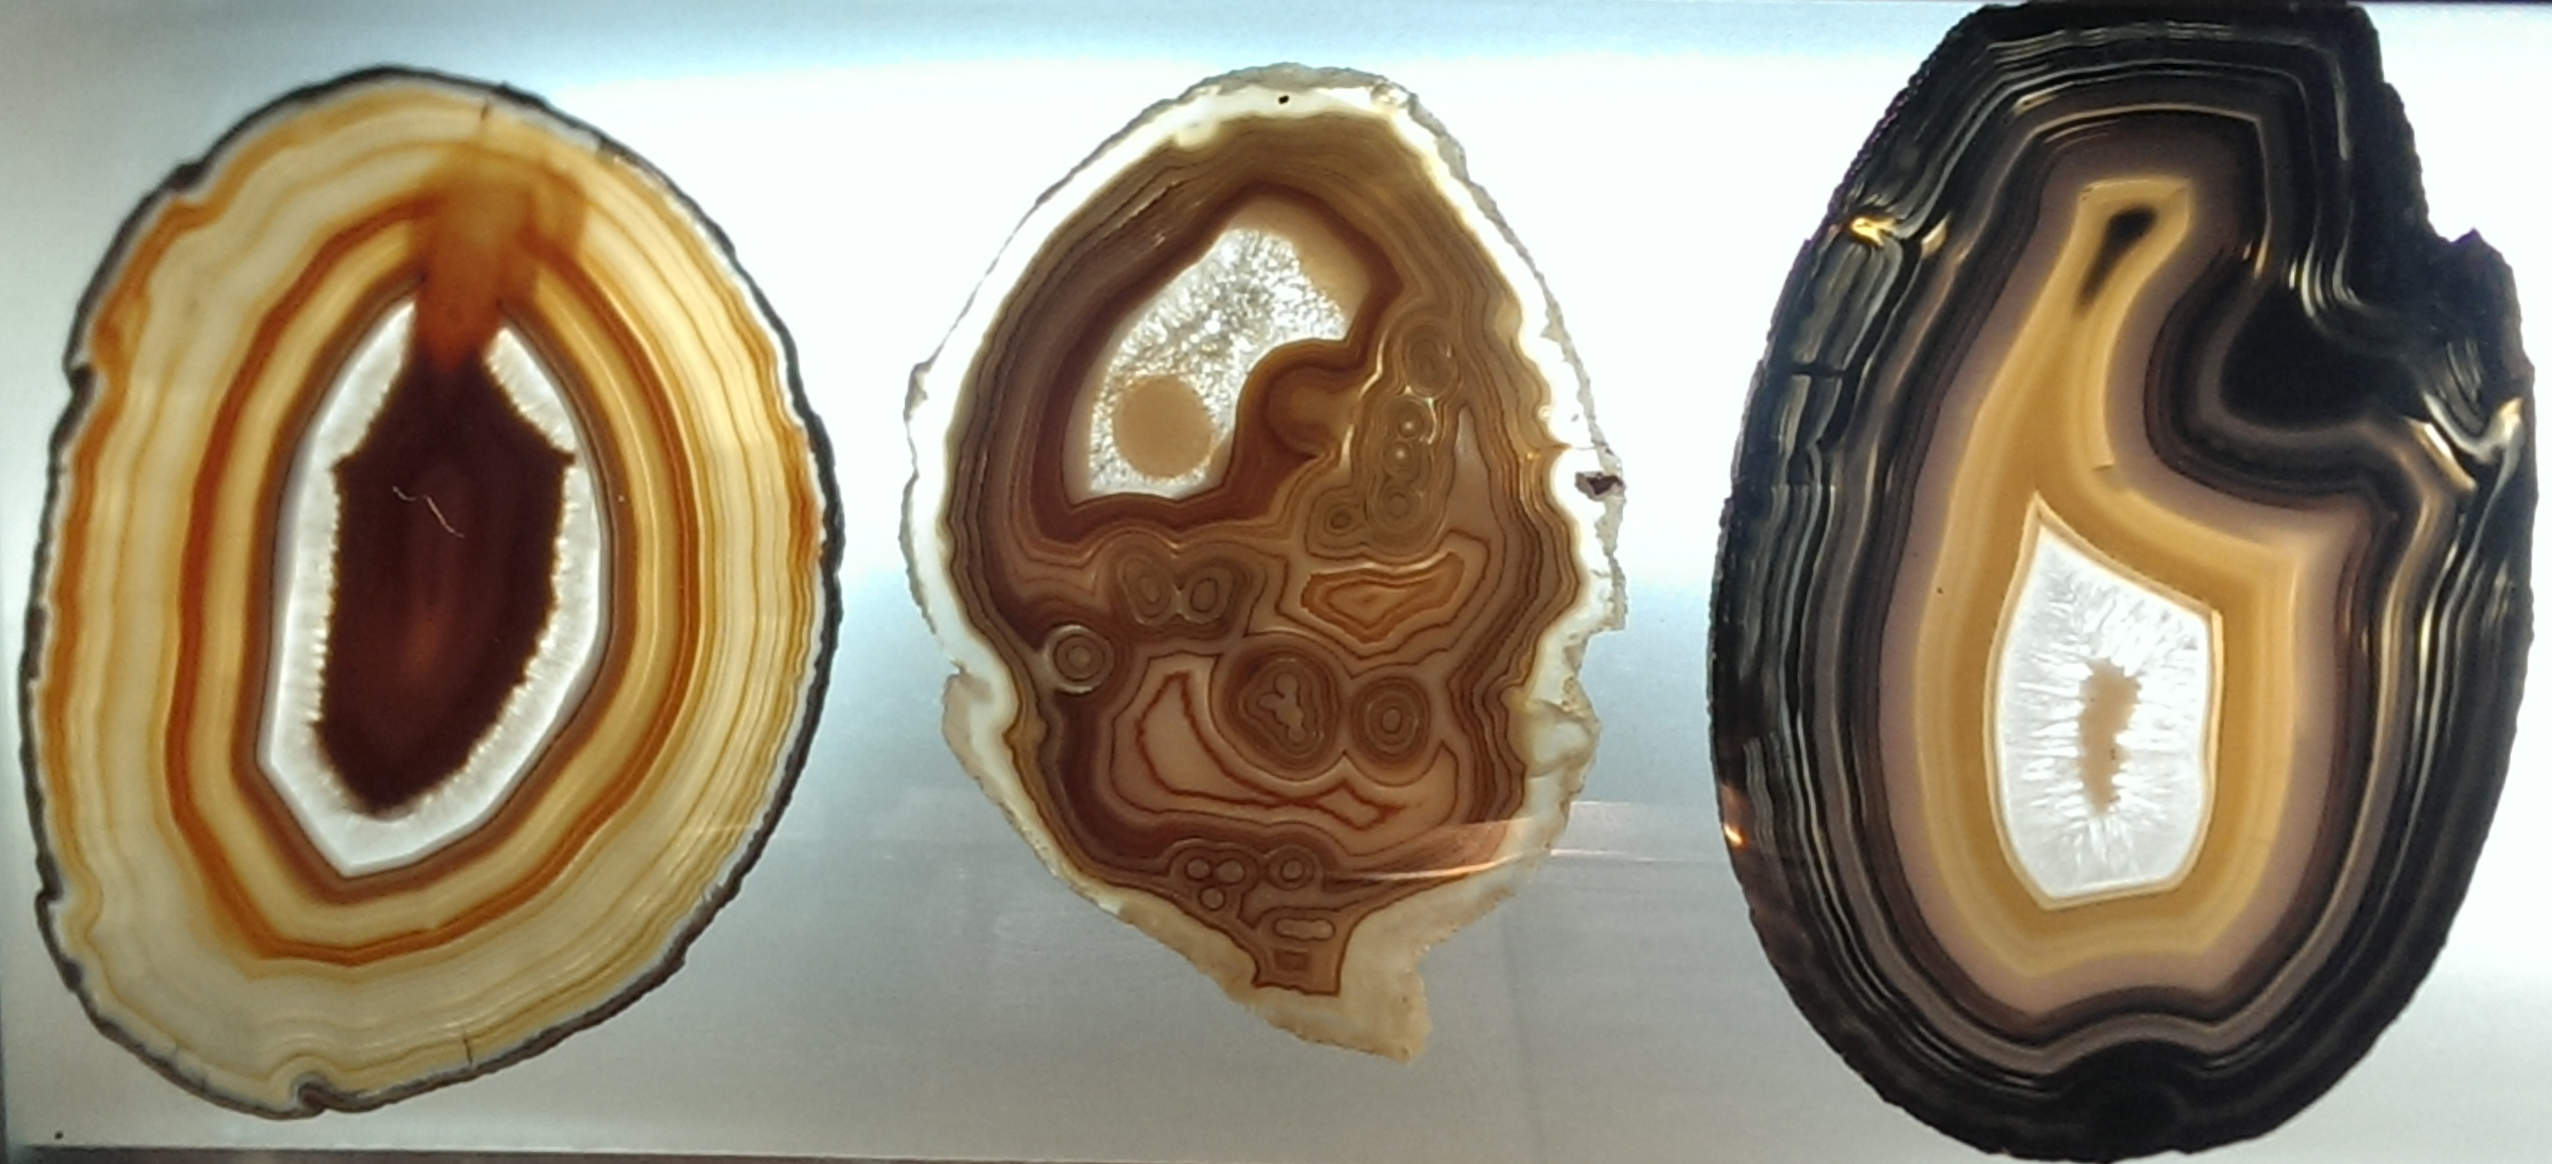 Agate samples